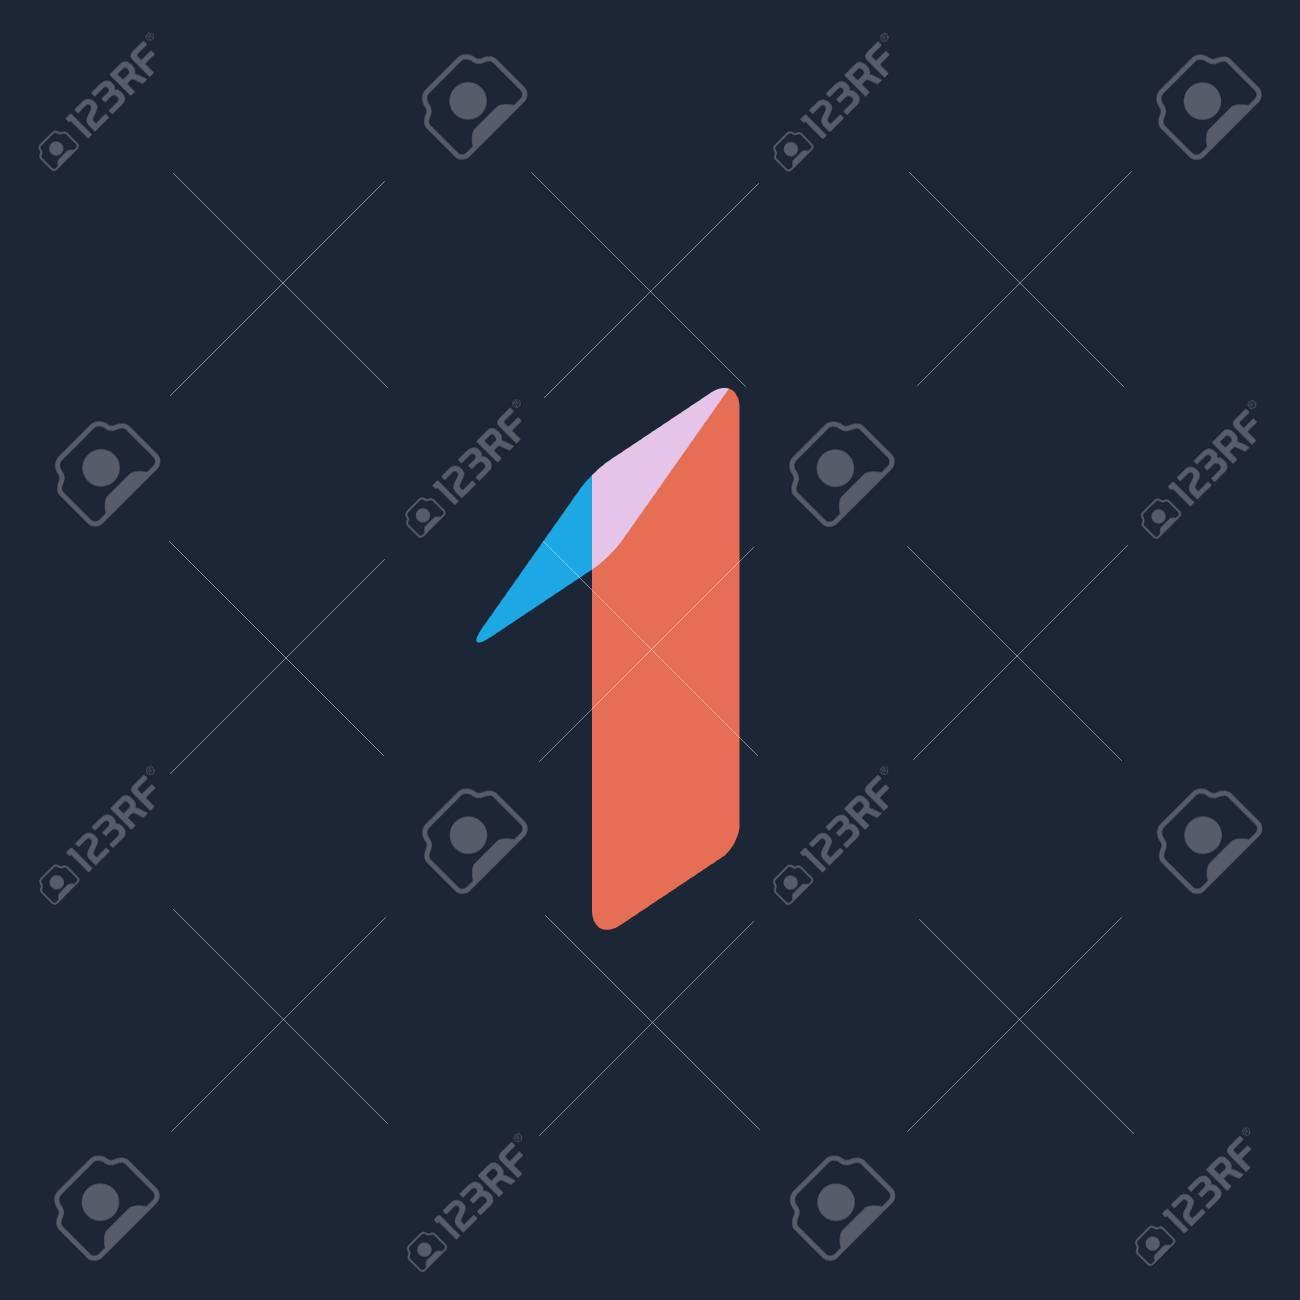 number 1 logo icon design template elements ロイヤリティフリー